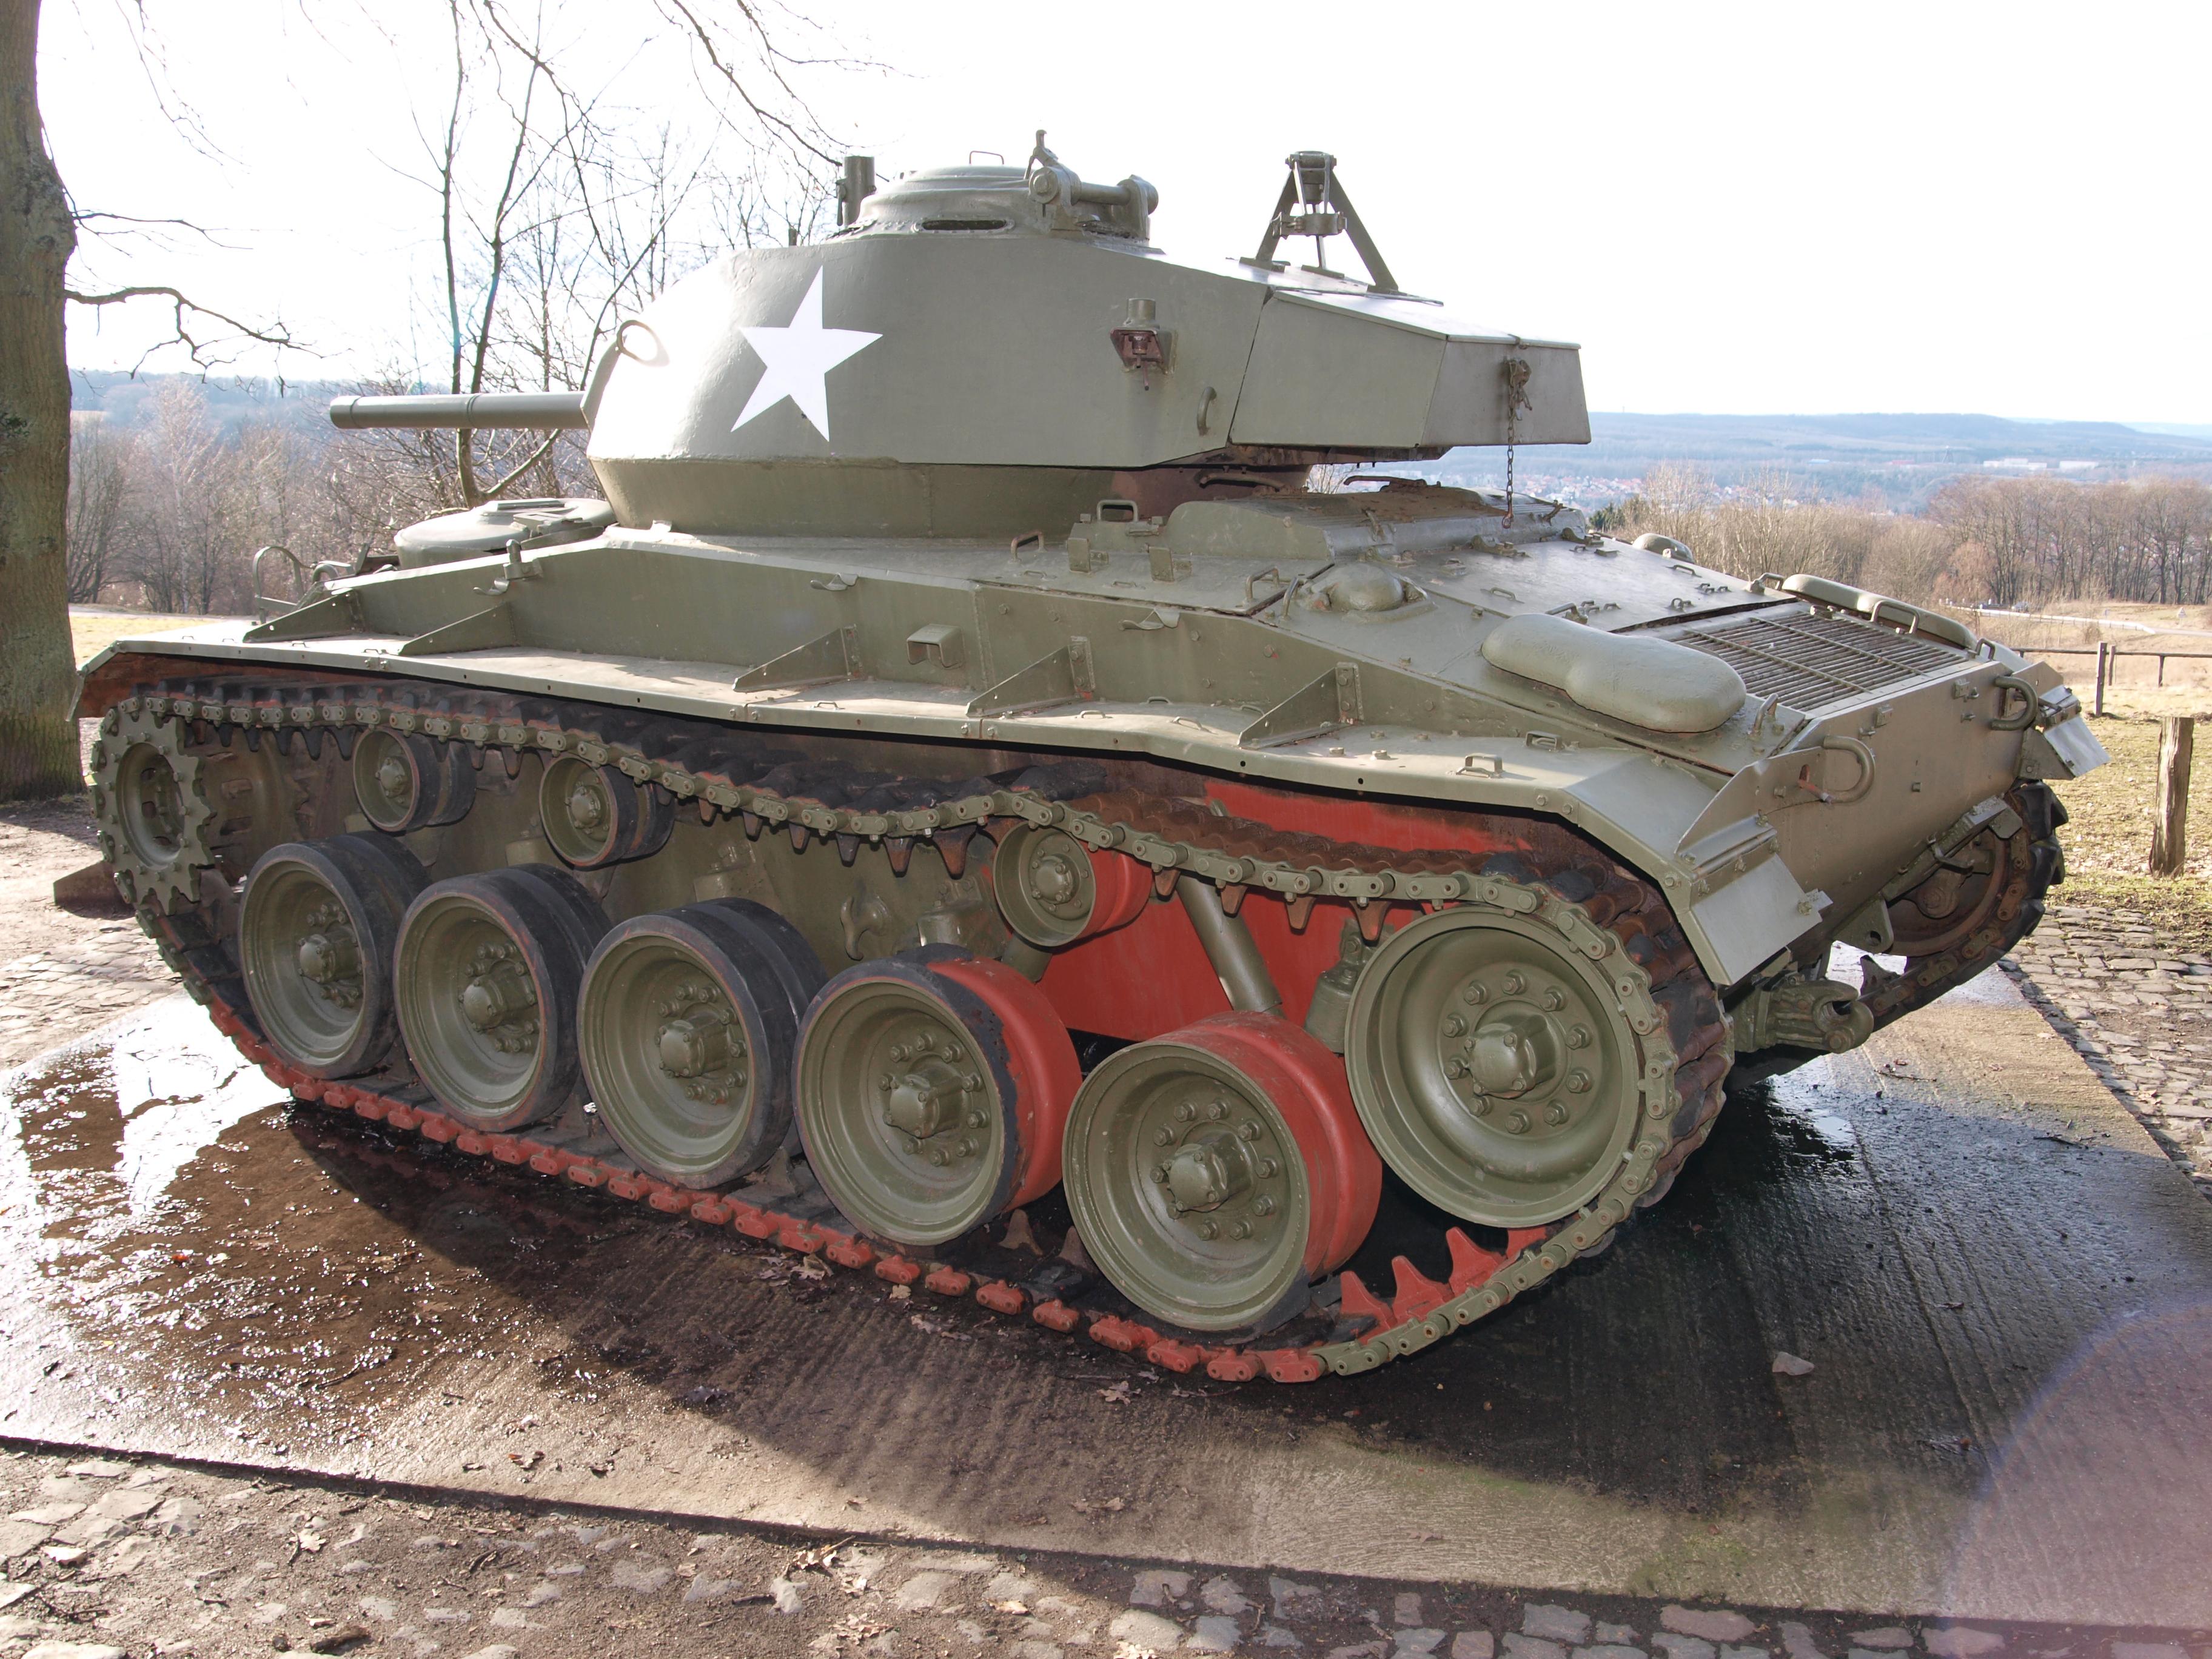 File:M24 Chaffee at Spicheren pic13.JPG - Wikimedia Commons M24 Tank